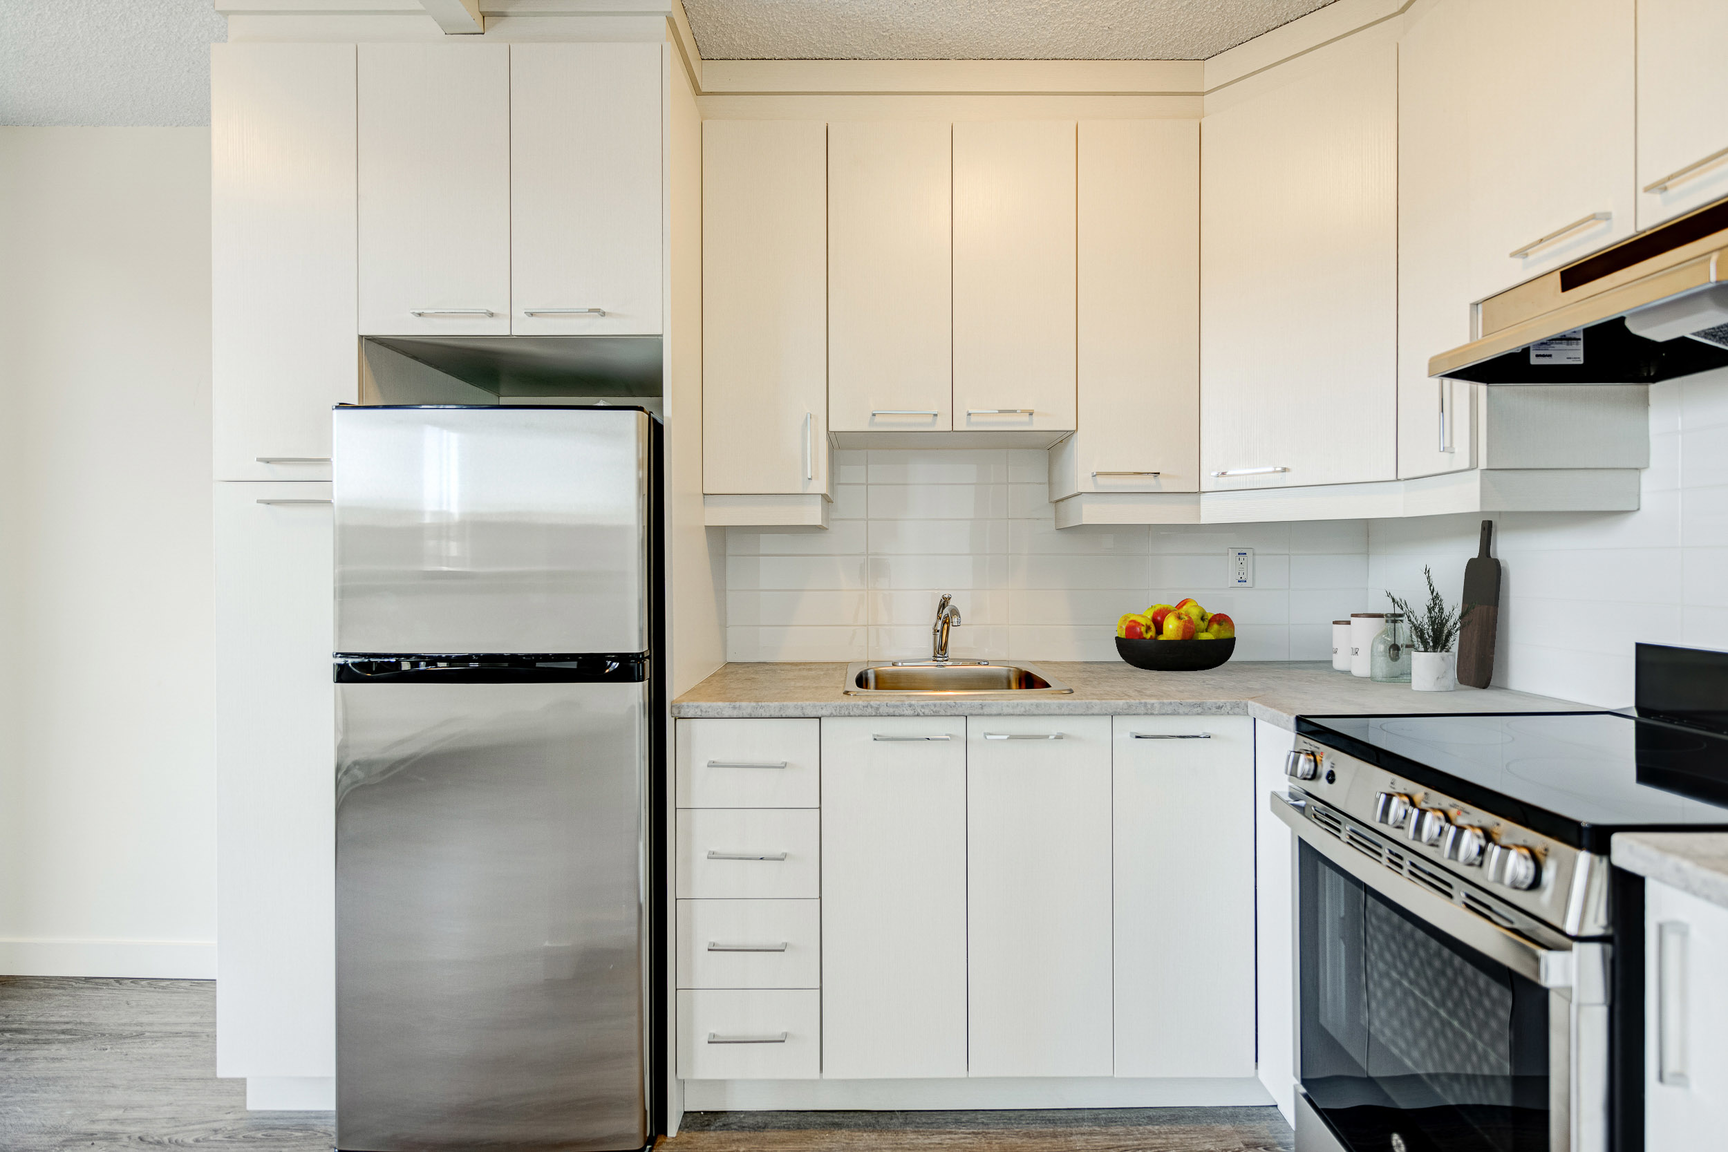 1 bedroom Apartments for rent in Laval at Le Quatre Cent - Photo 09 - RentersPages – L407184